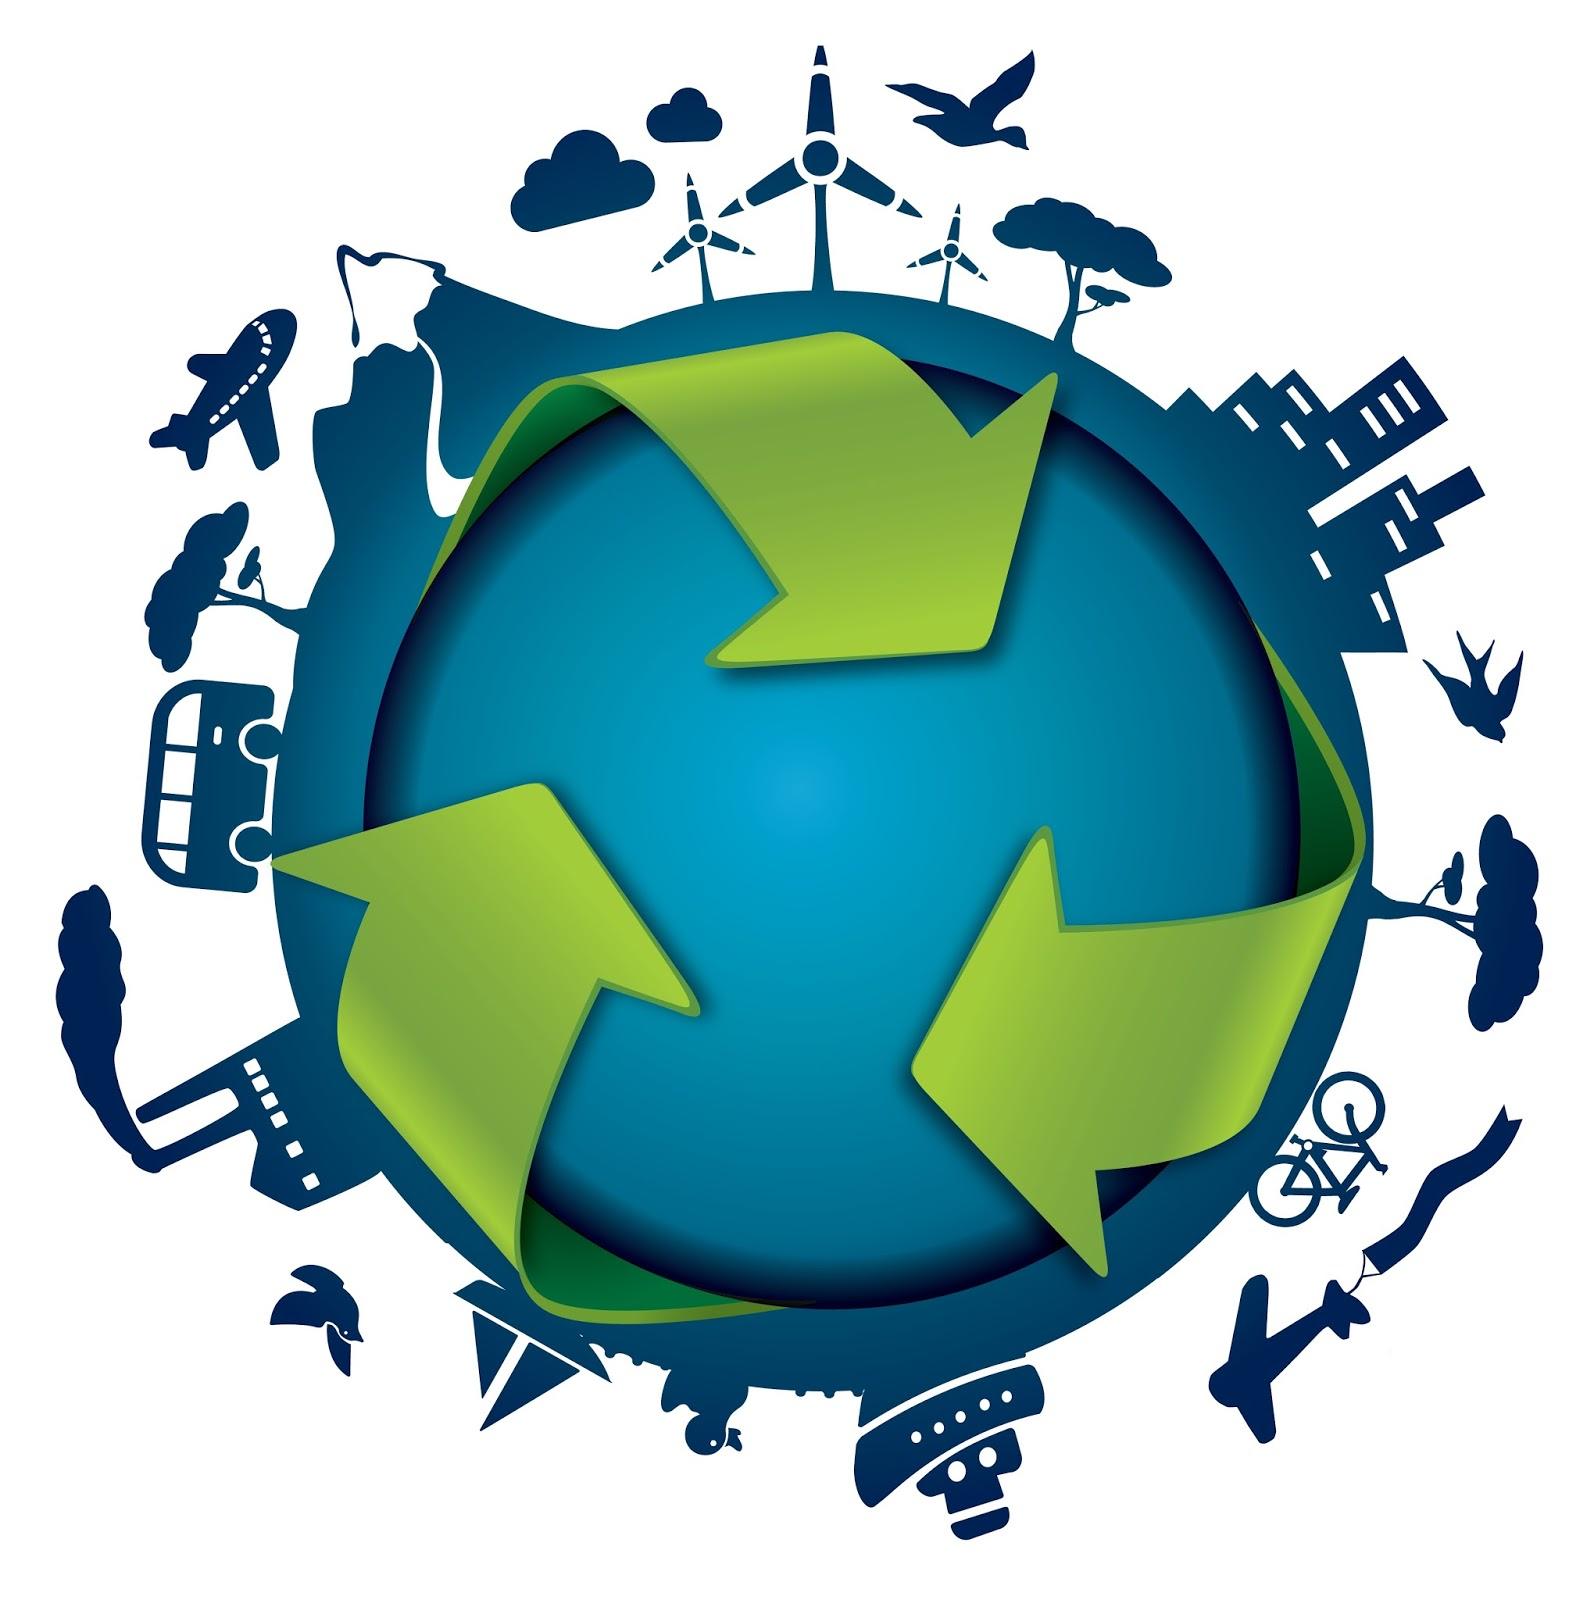 Cdp Uk Climate Change Report 2015 3bl Media